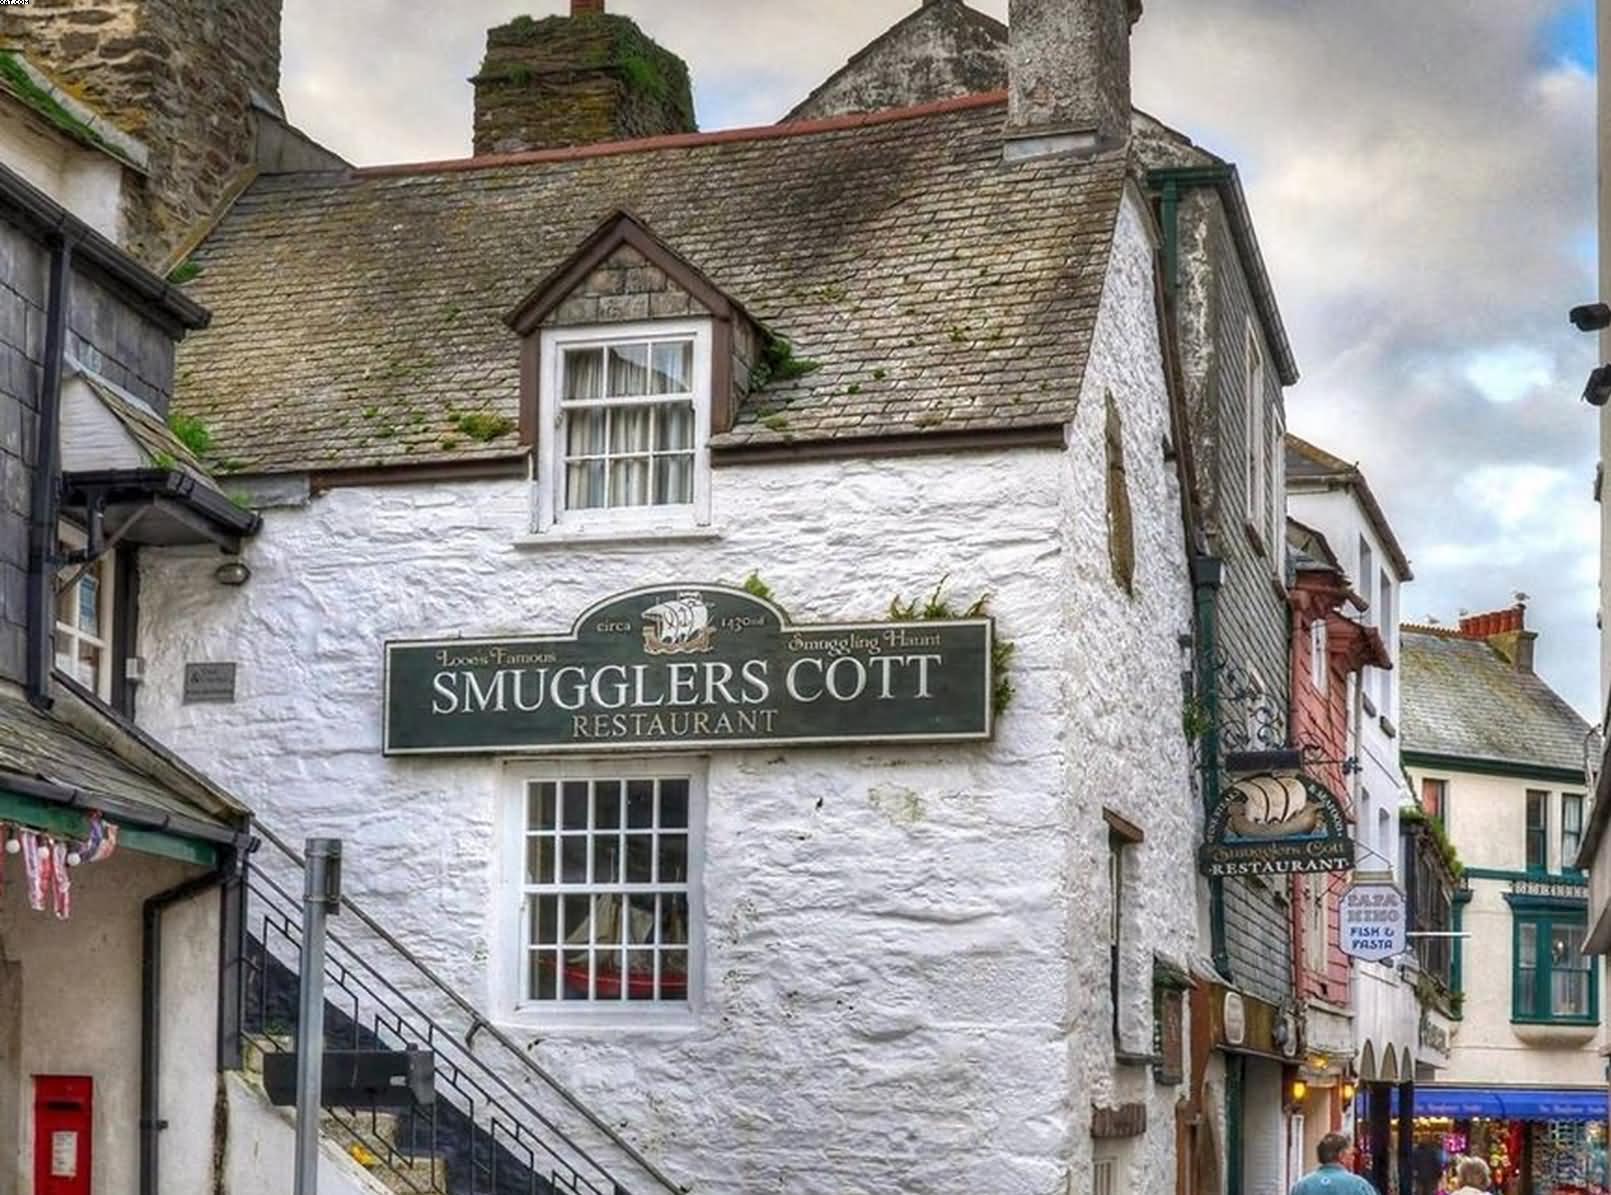 Smugglers Cott Restaurant in Looe Cornwall